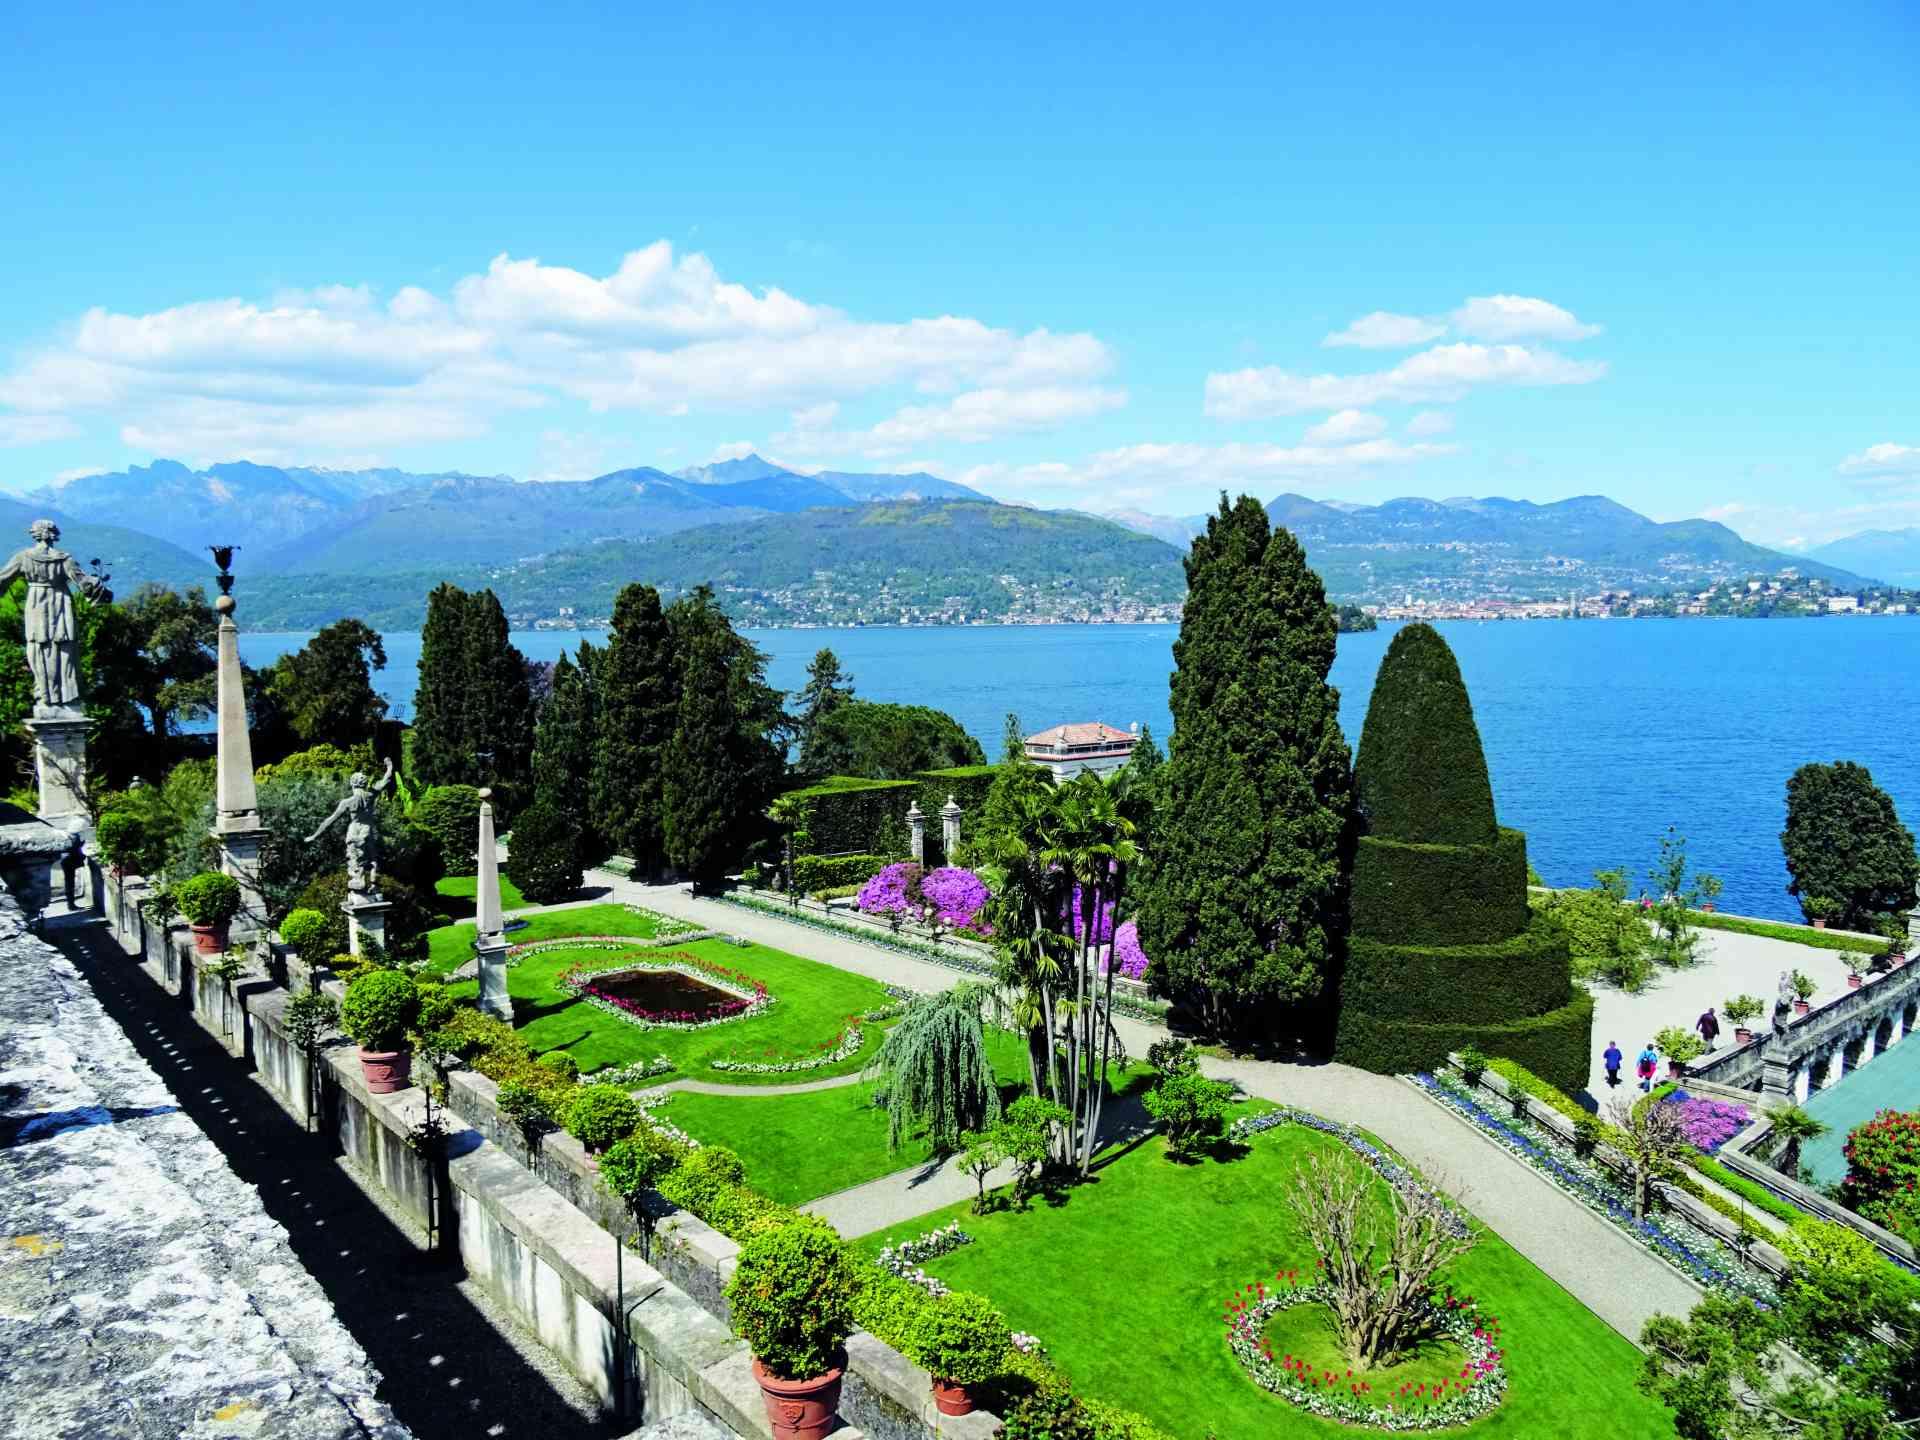 Lake Maggiore, Italy by Sacha Bunnik